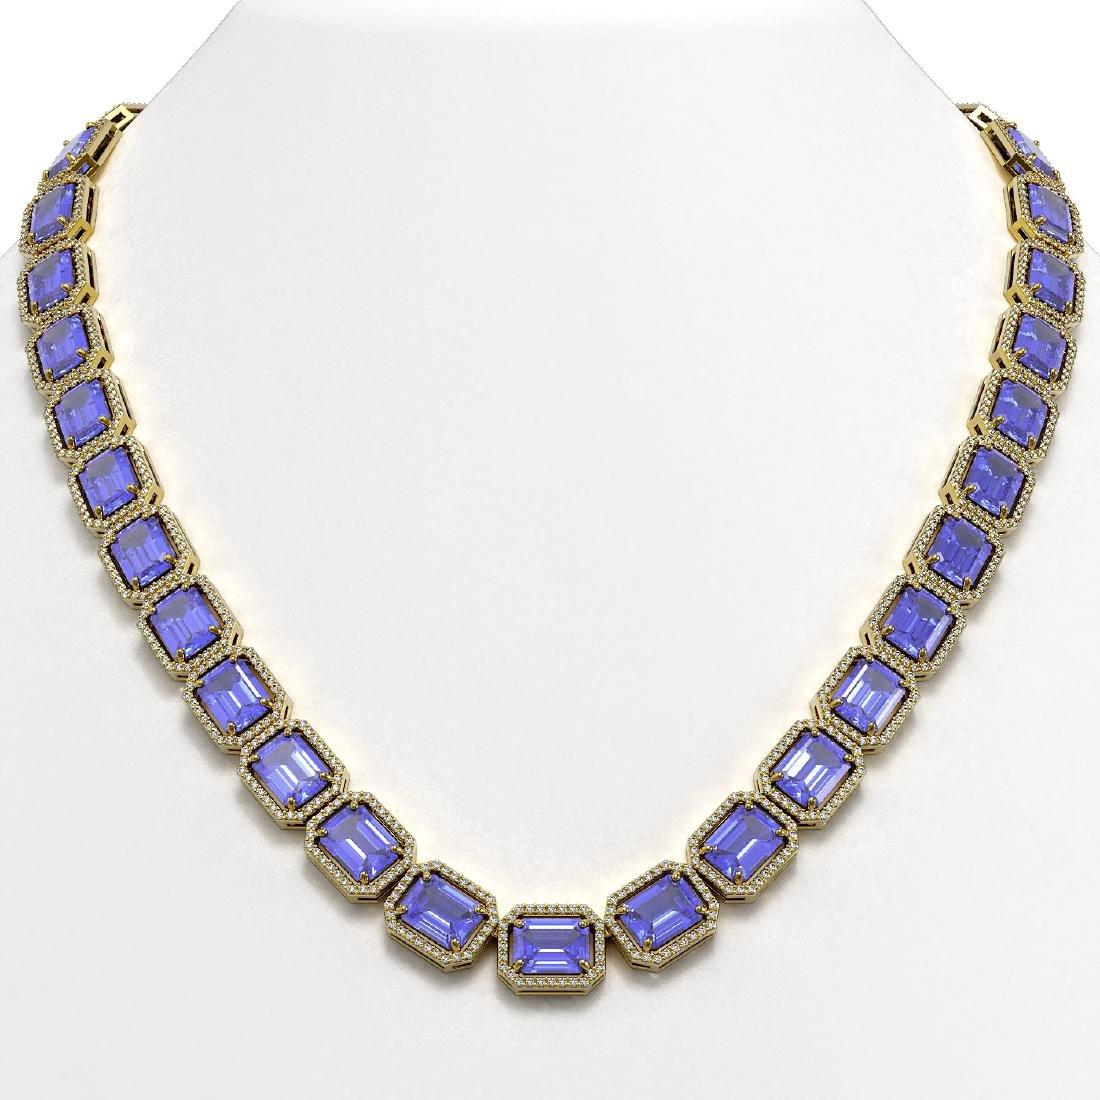 79.99 CTW Tanzanite & Diamond Halo Necklace 10K Yellow